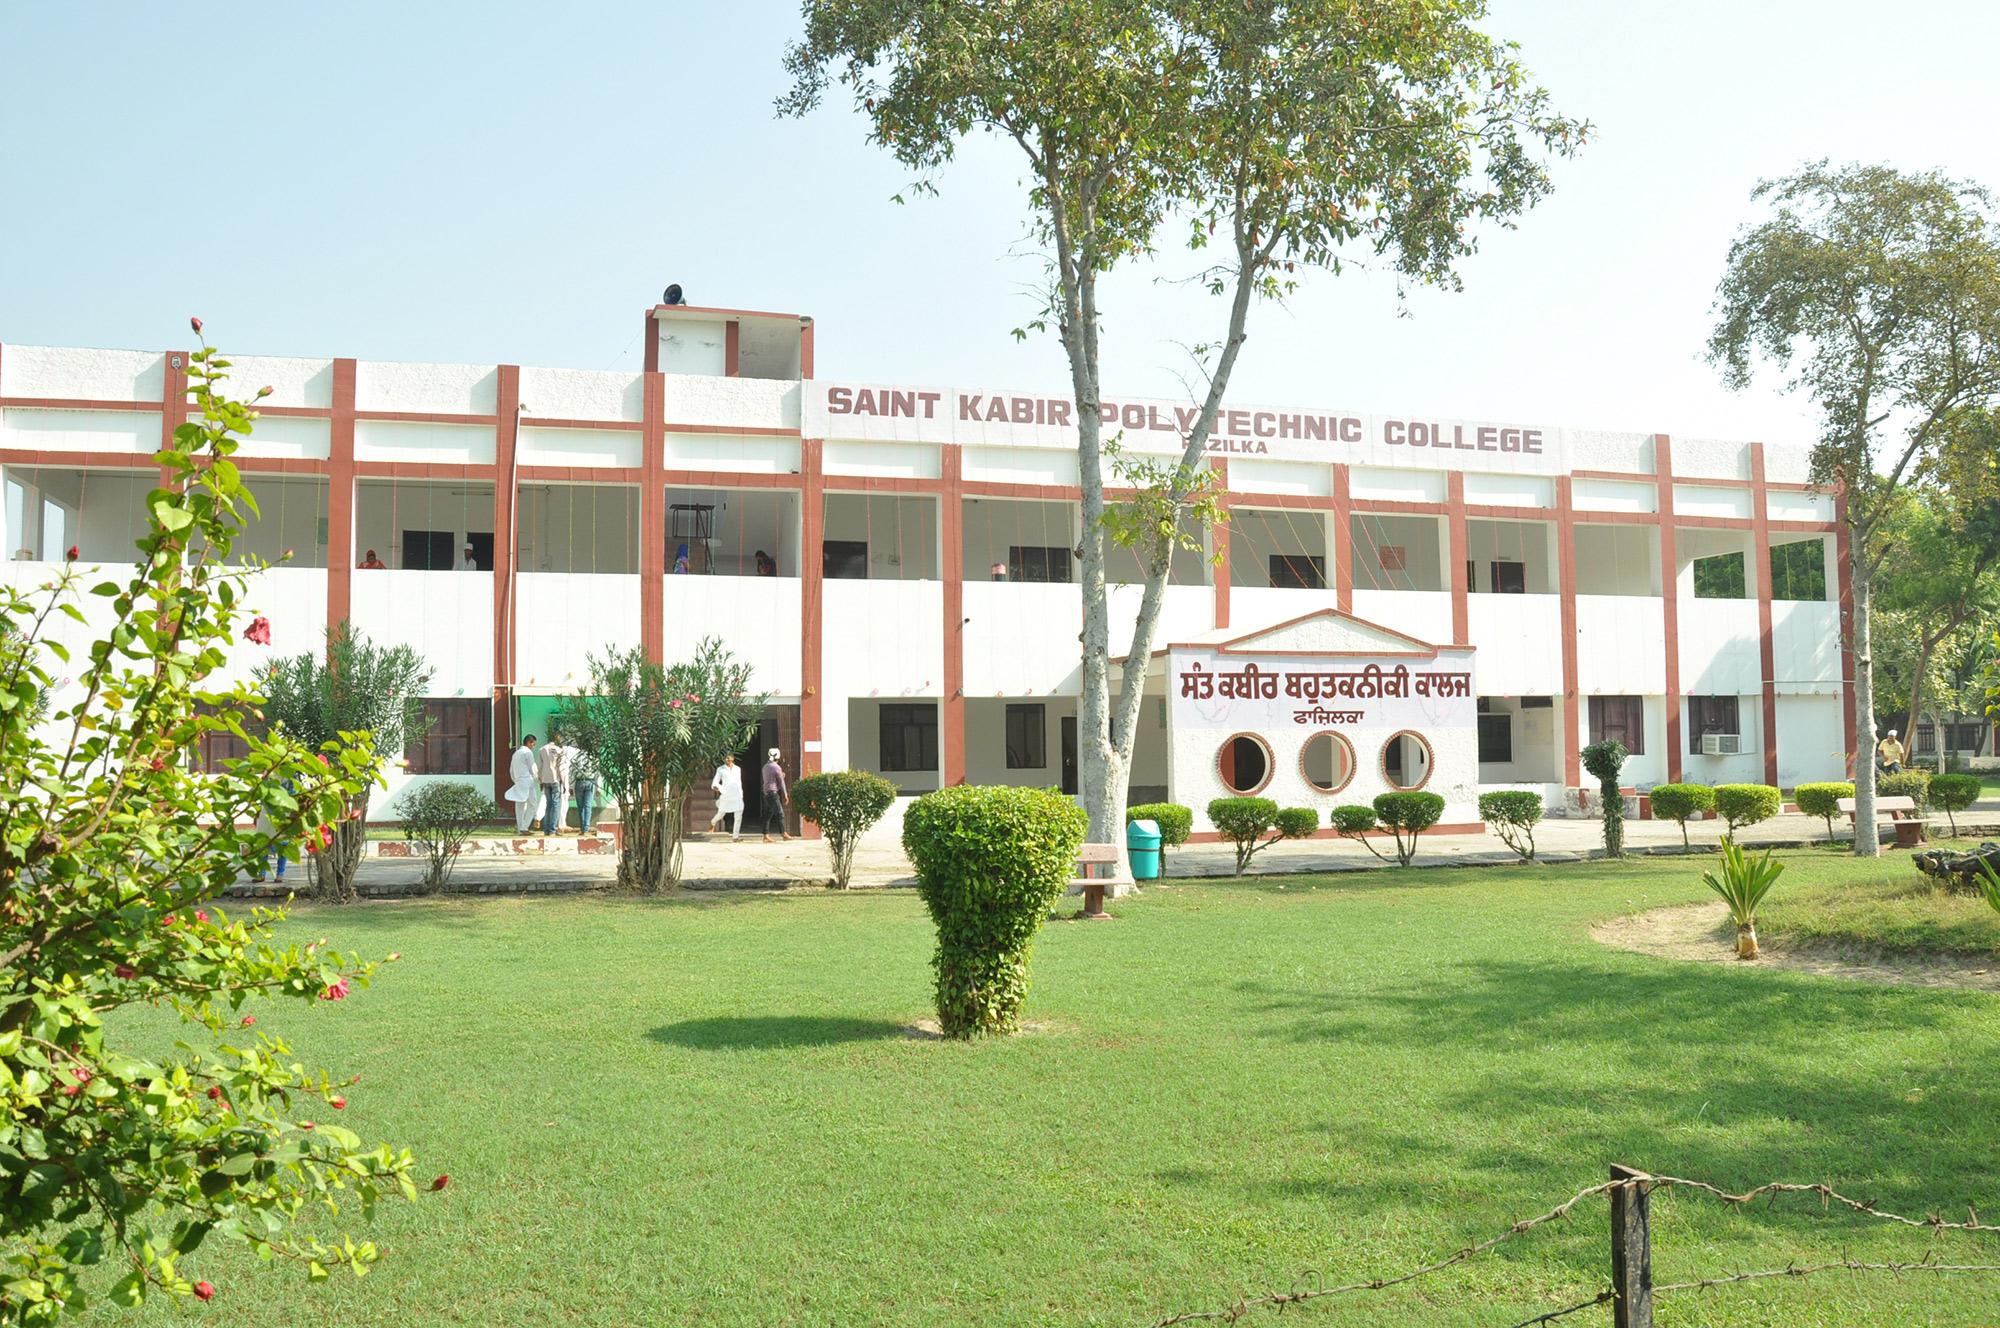 Saint Kabir Polytechnic College, Fazilka